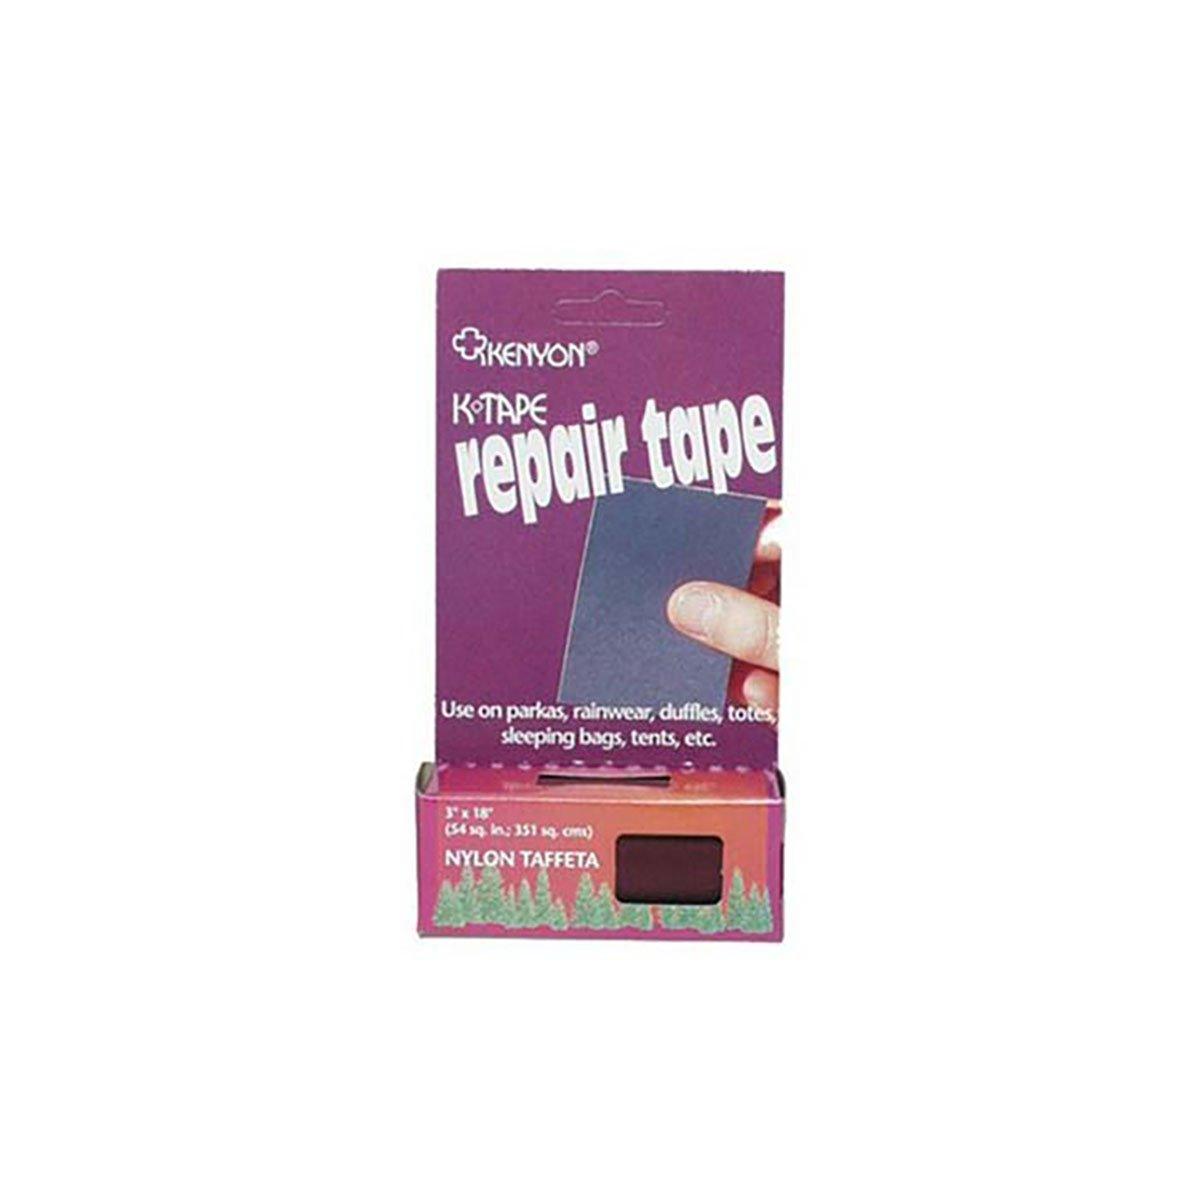 Best Rated in Outdoor Gear Repair Equipment & Helpful Customer Reviews - Amazon.com